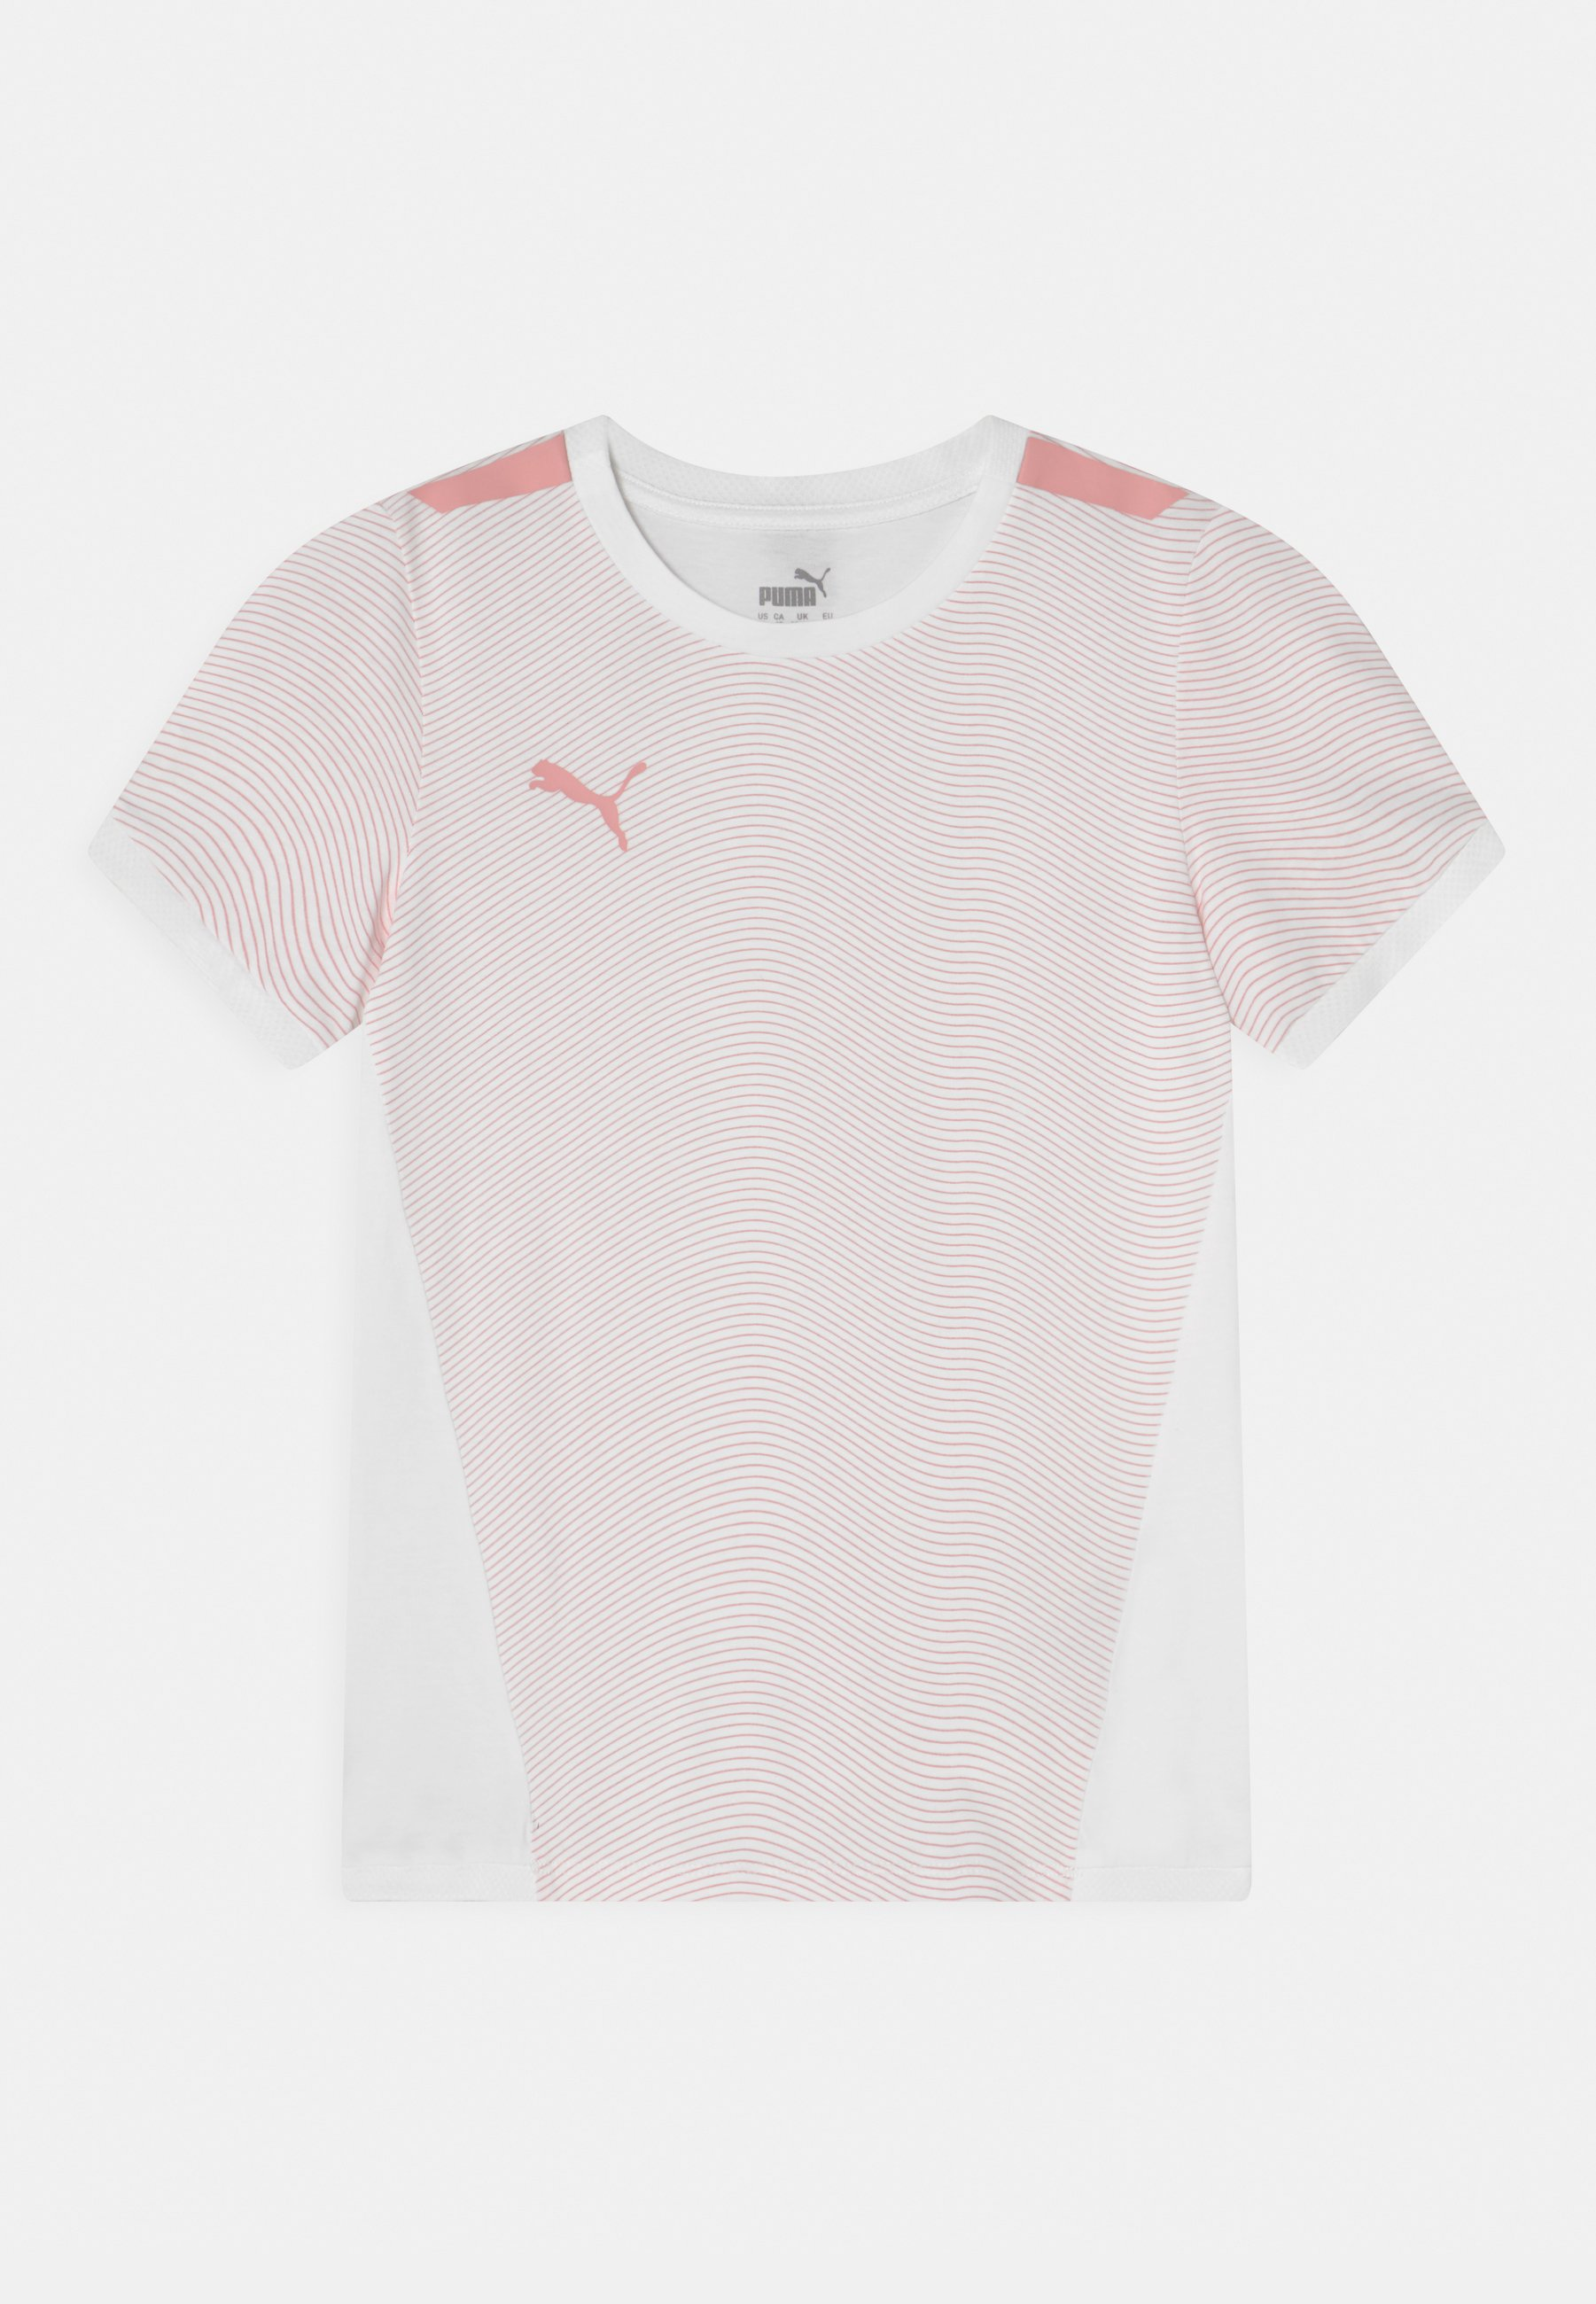 Bambini INDIVIDUAL LIGA GIRLS TEE - T-shirt con stampa